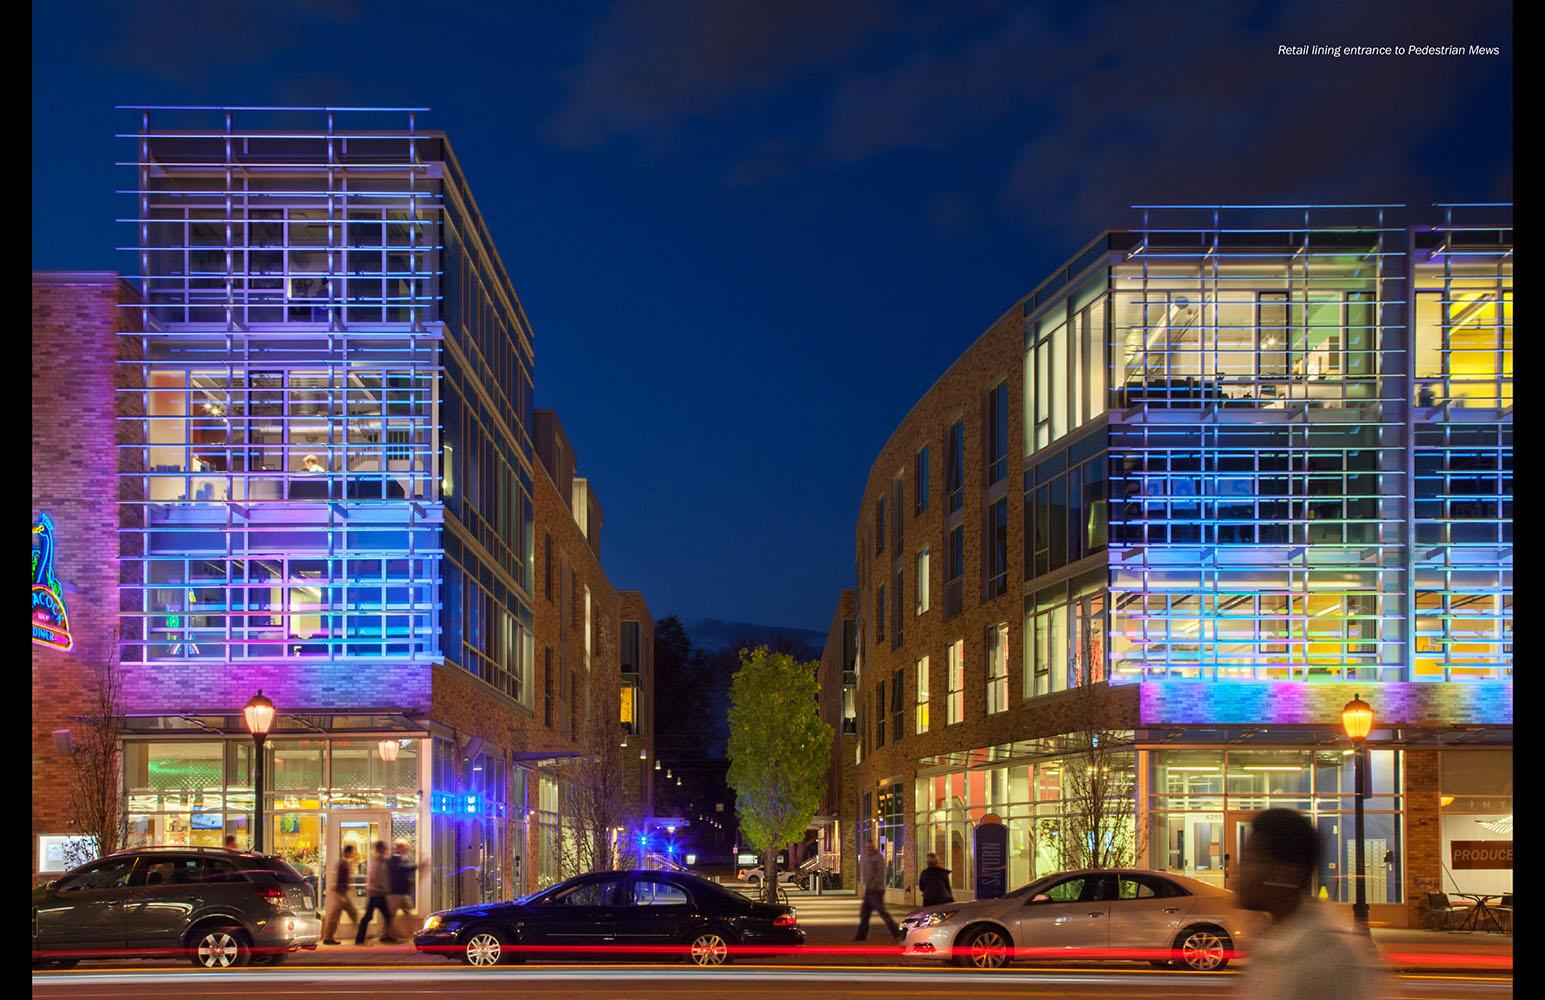 The Lofts, Washington University